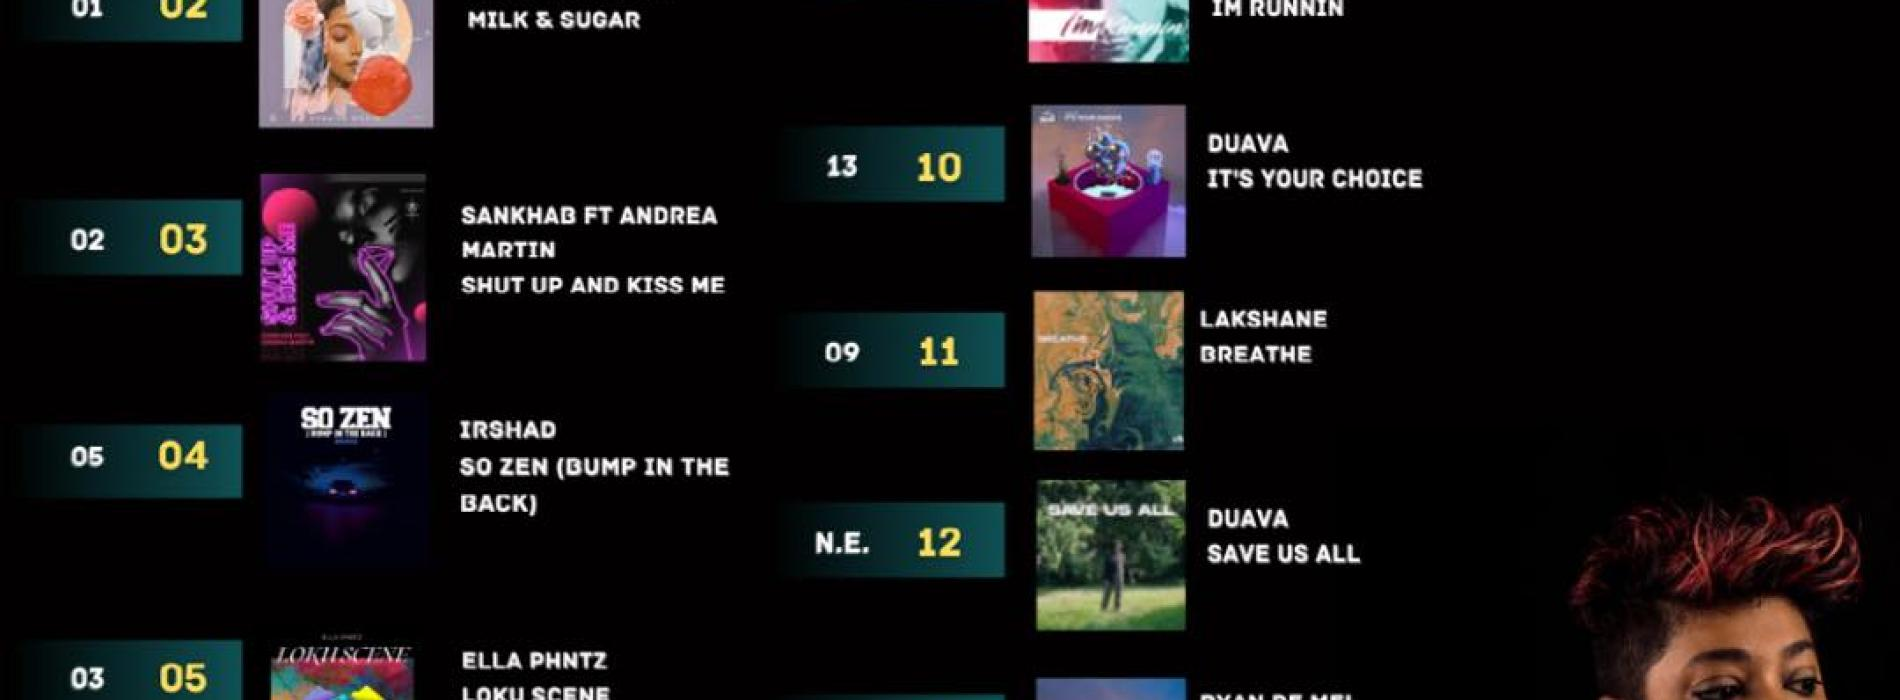 News : Kroger, Dj Mass & Romaine Willis Hit Number 1!